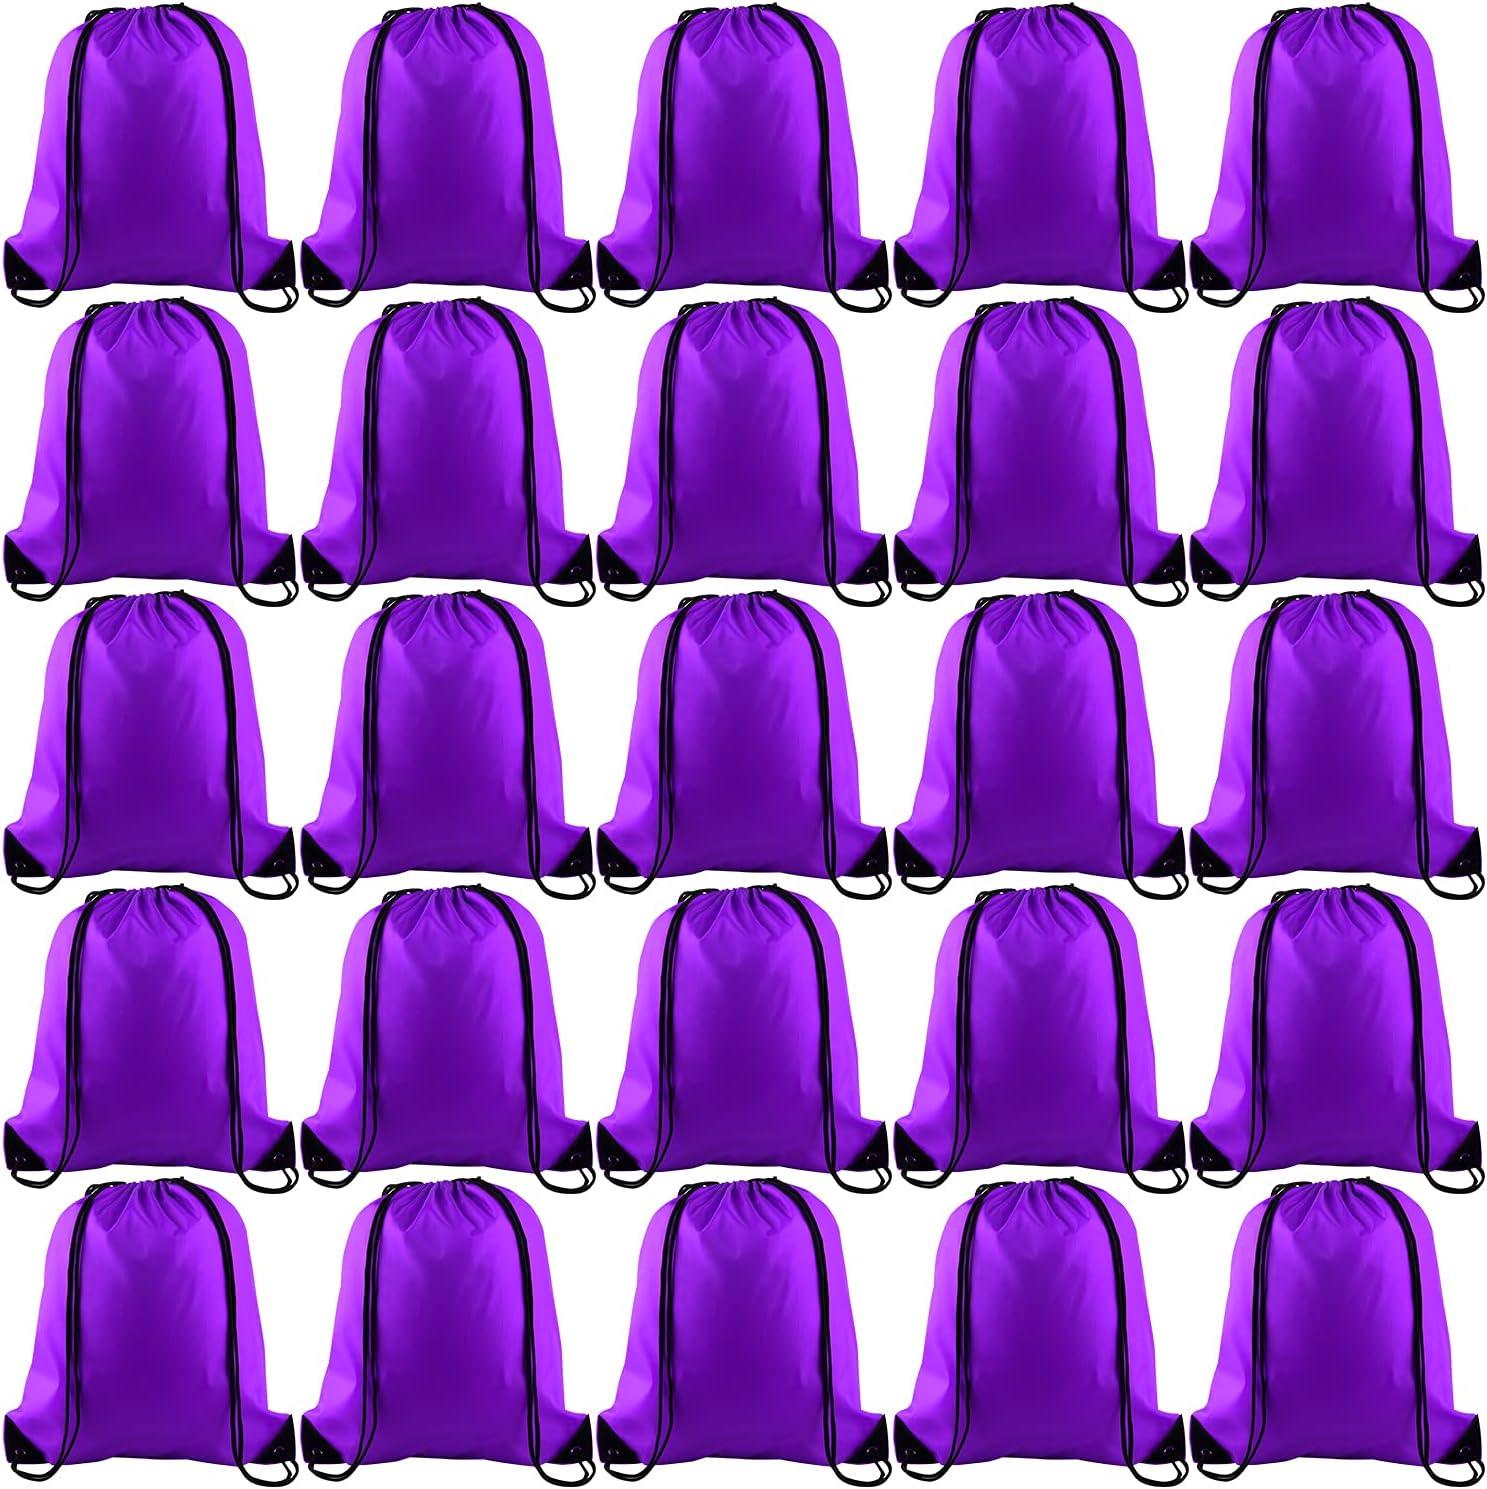 KUUQA 25Pcs Purple Drawstring Backpack Bulk Drawstring Bags String Backpack Cinch Gym Backpack for Gym Sport Traveling